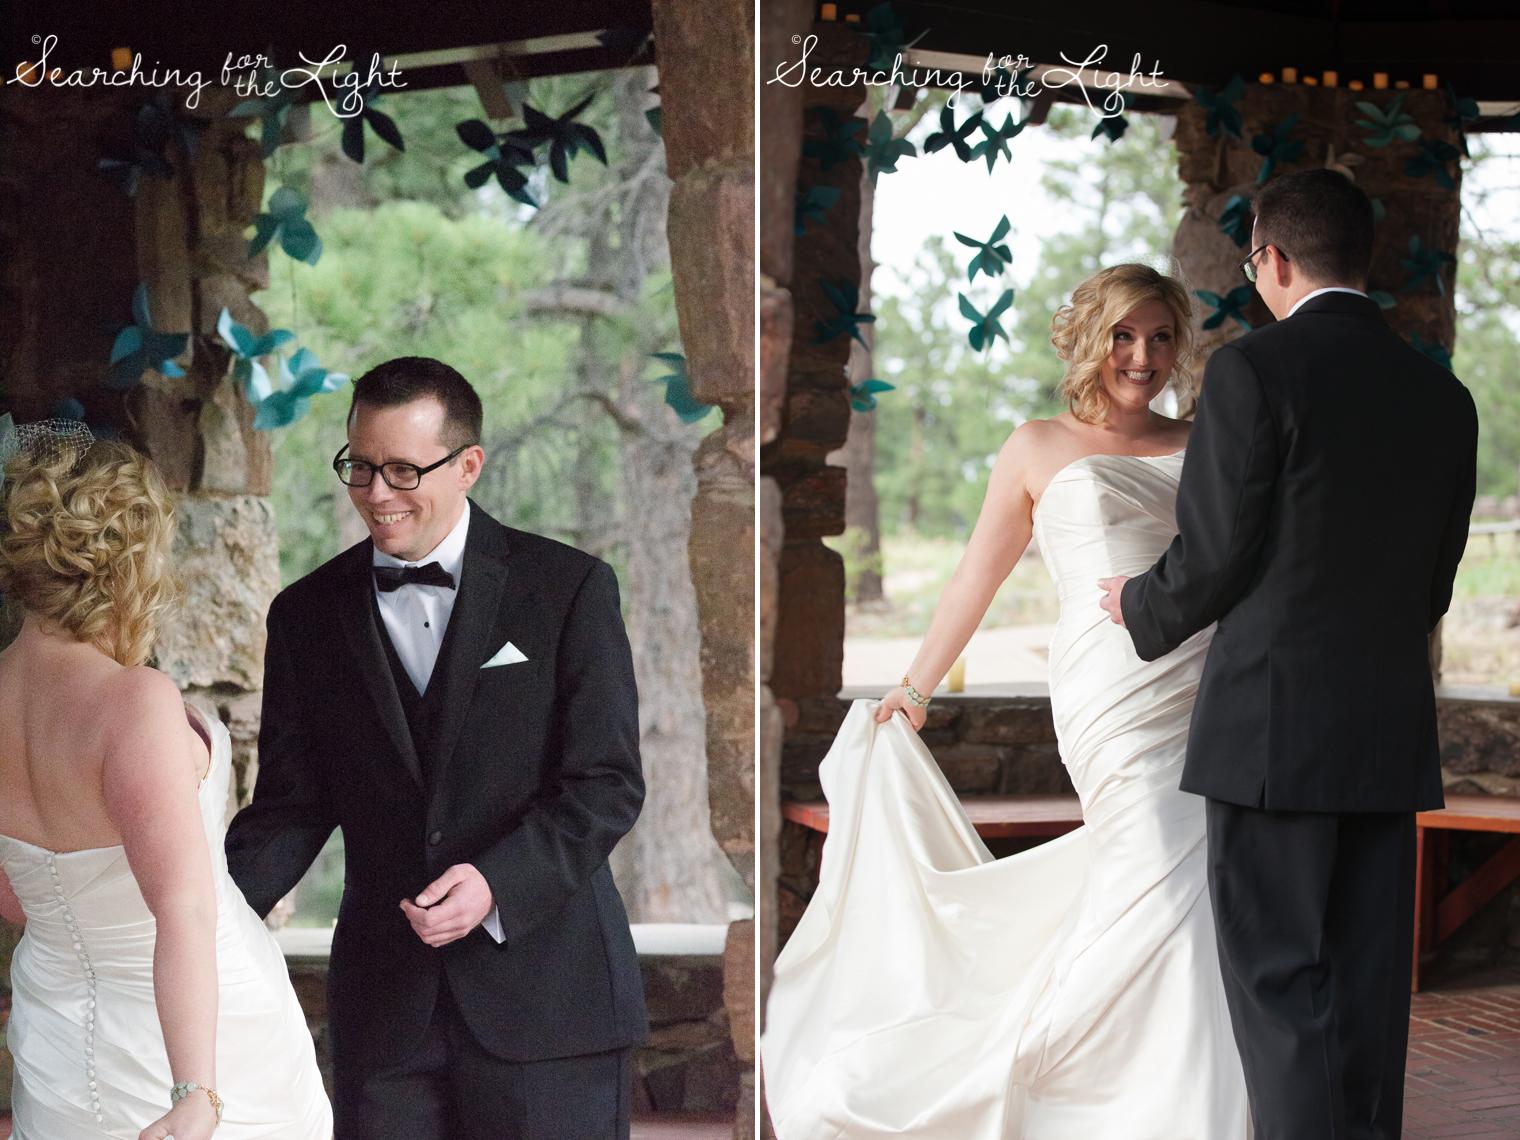 First Look Boettcher Mansion wedding photos from a Denver wedding photographer